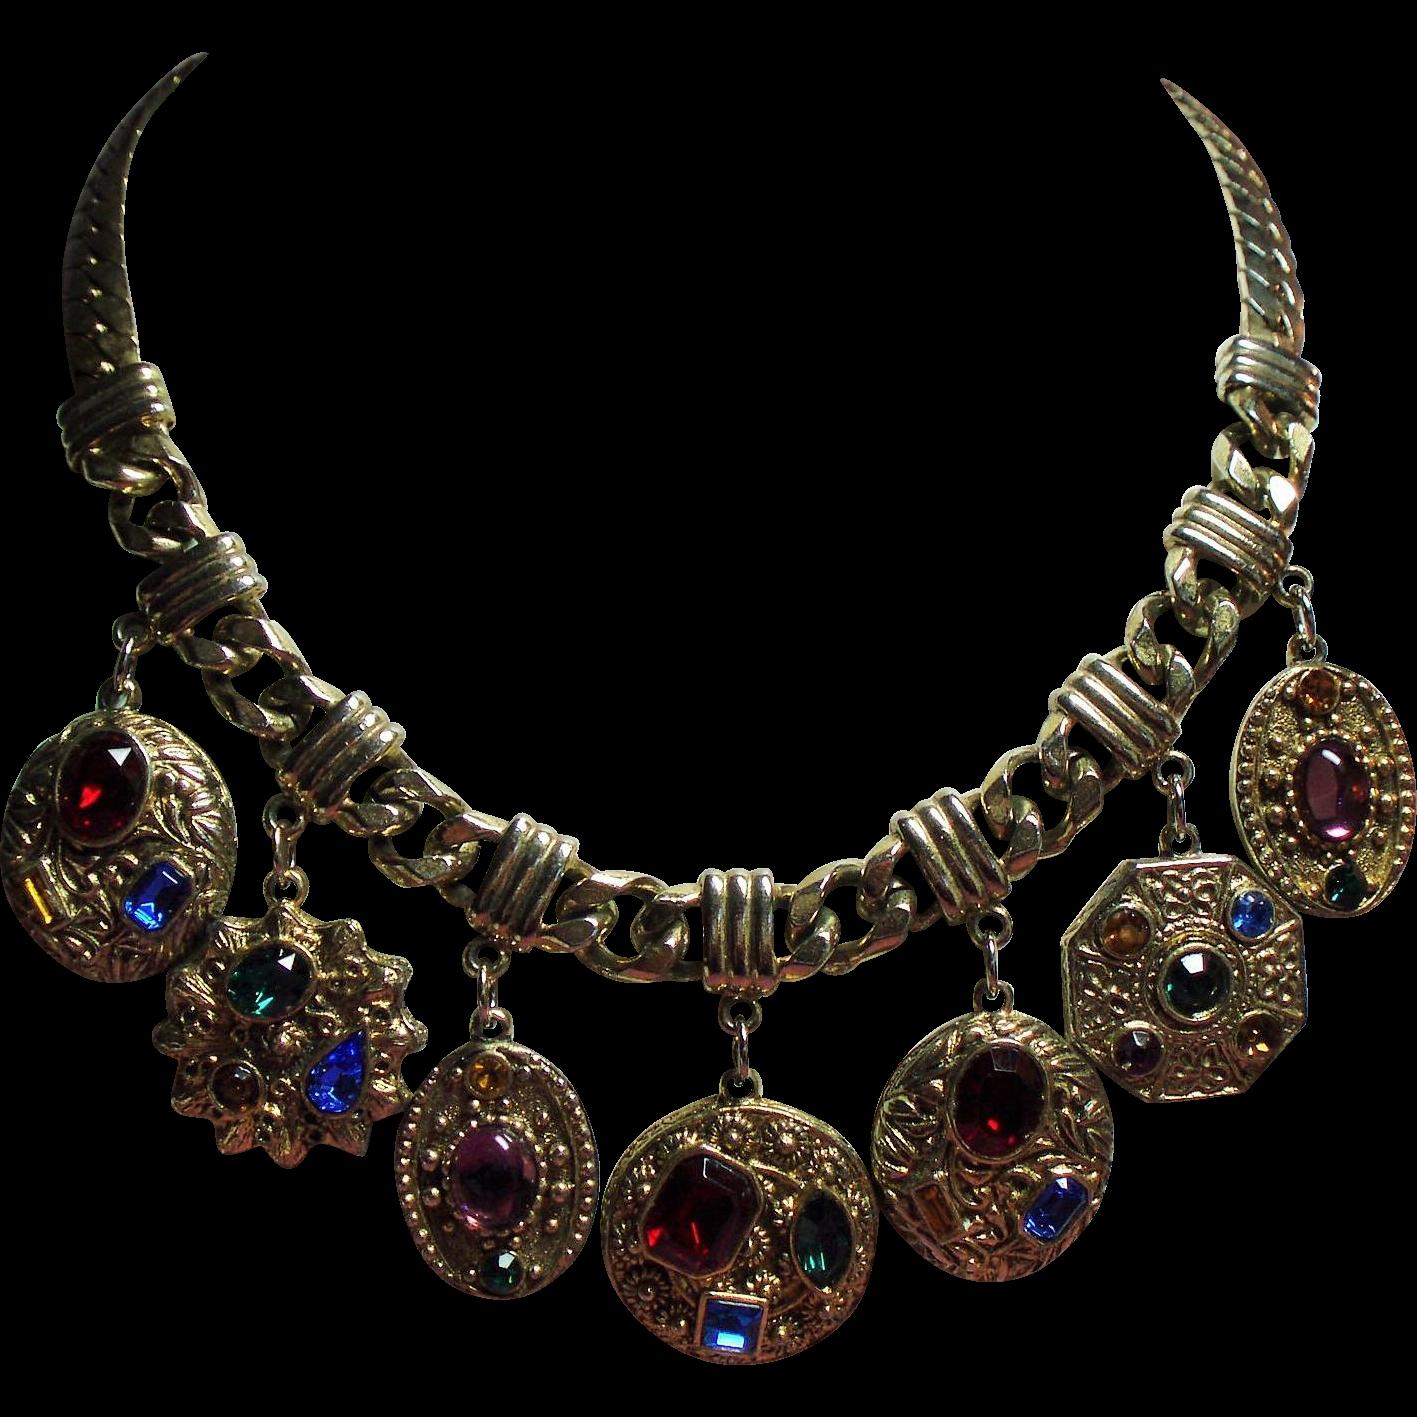 Vintage Jewel Tone Rhinestone Hefty Medallion Necklace